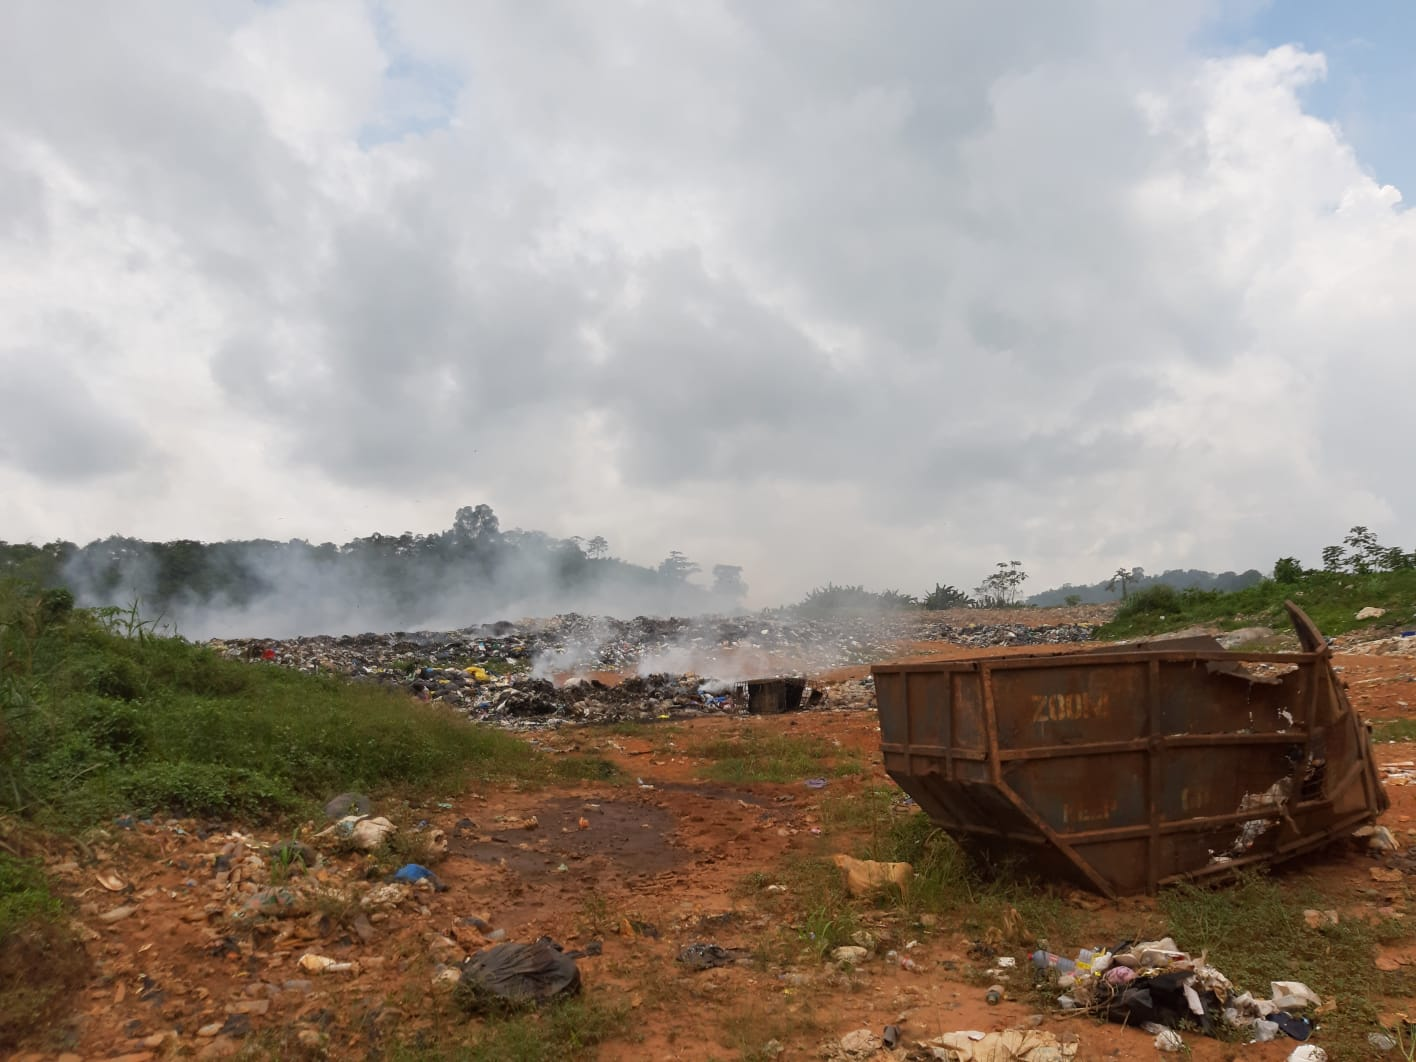 Elektroschrottplatz Agbogbloshie in Accra (Ghana)